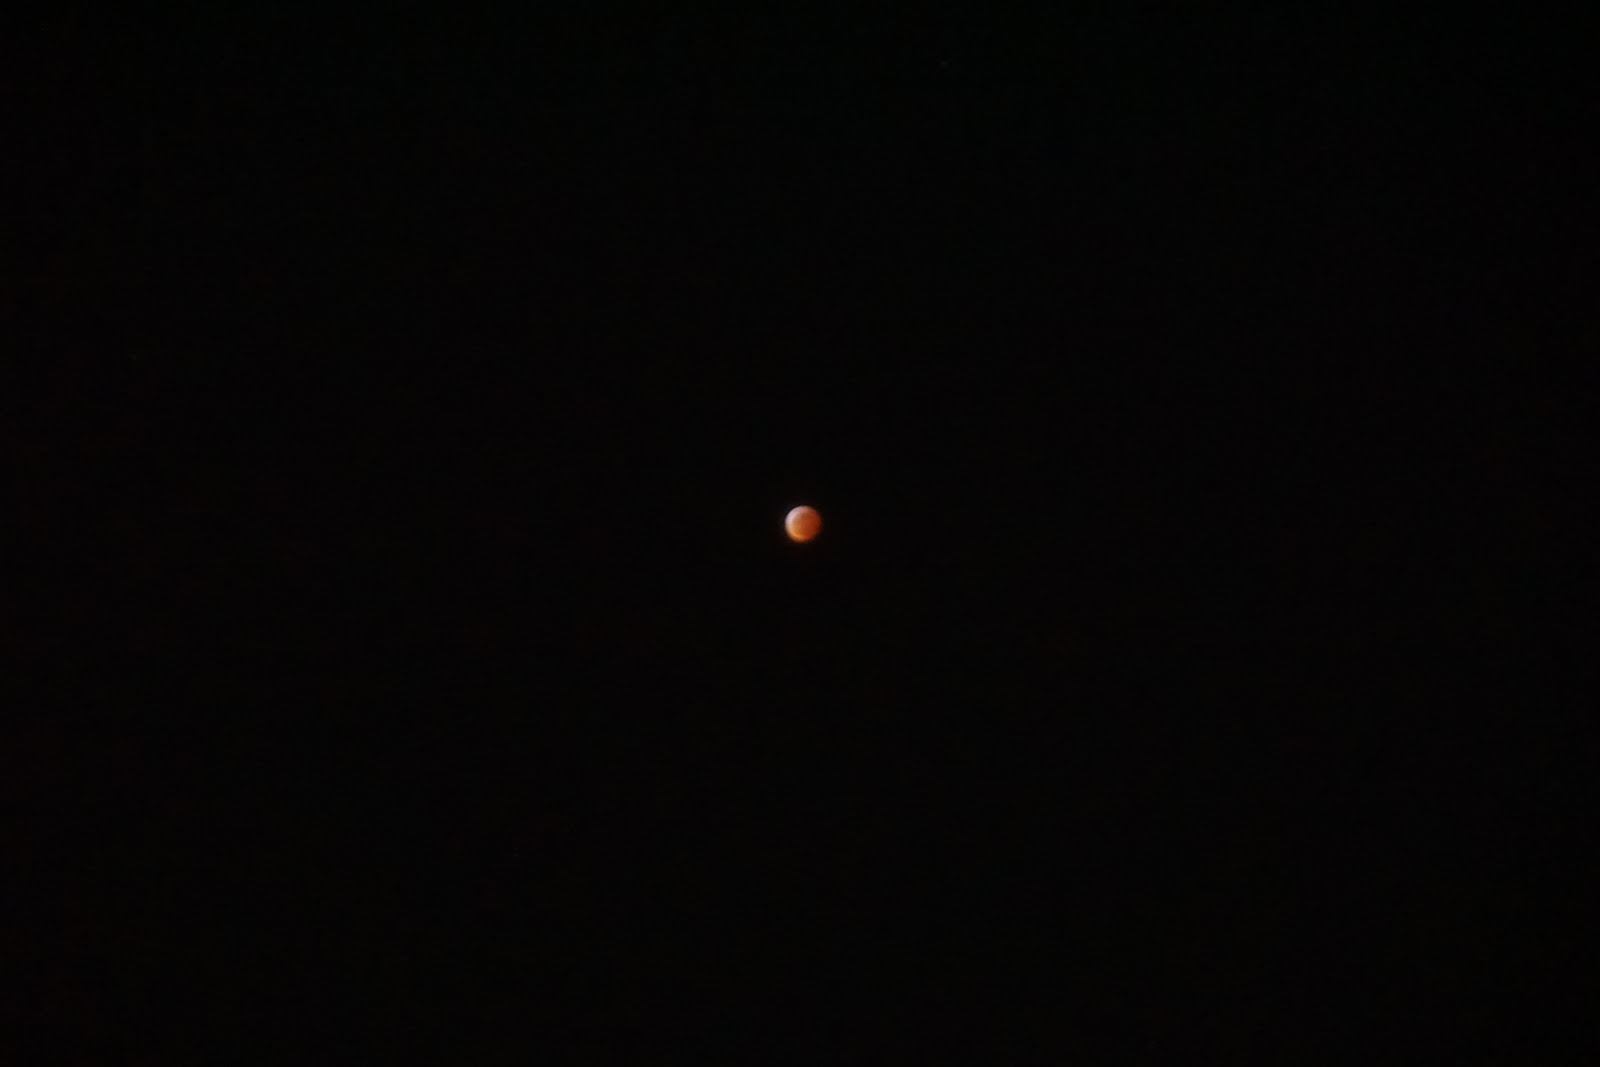 blood moon july 2018 calgary - photo #36